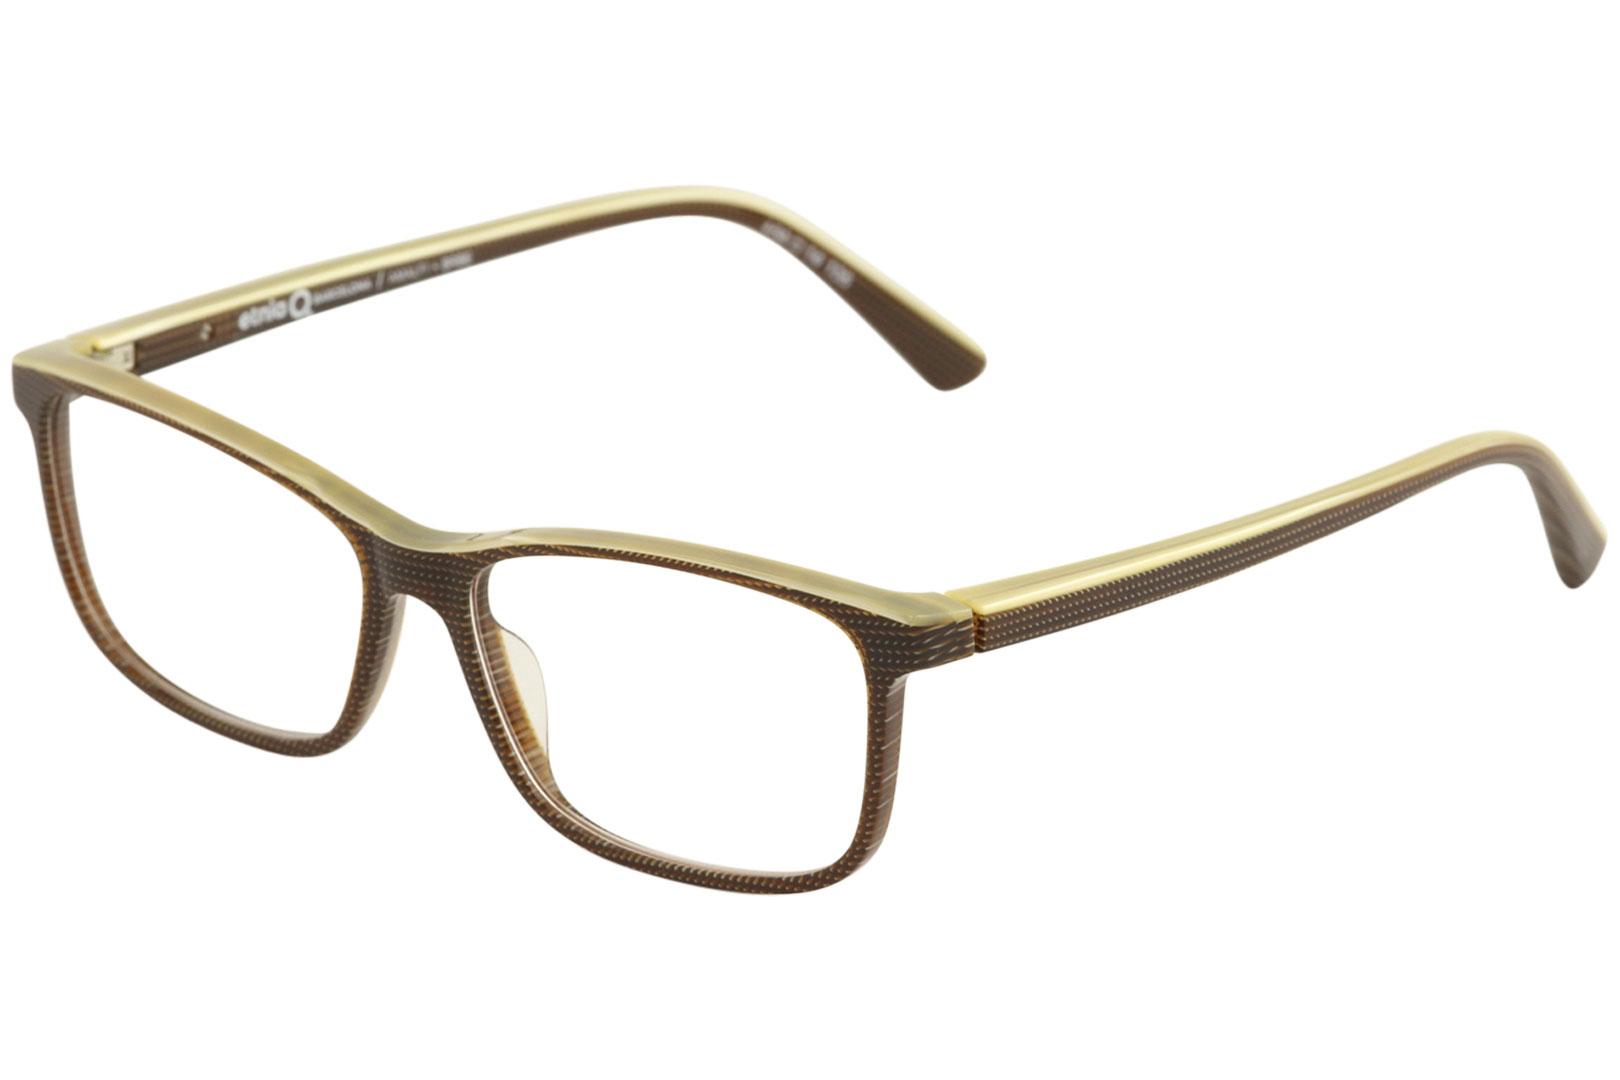 cc8792b267 Details about Etnia Barcelona Women s Eyeglasses Amalfi BRBE Brown Beige  Optical Frame 54mm